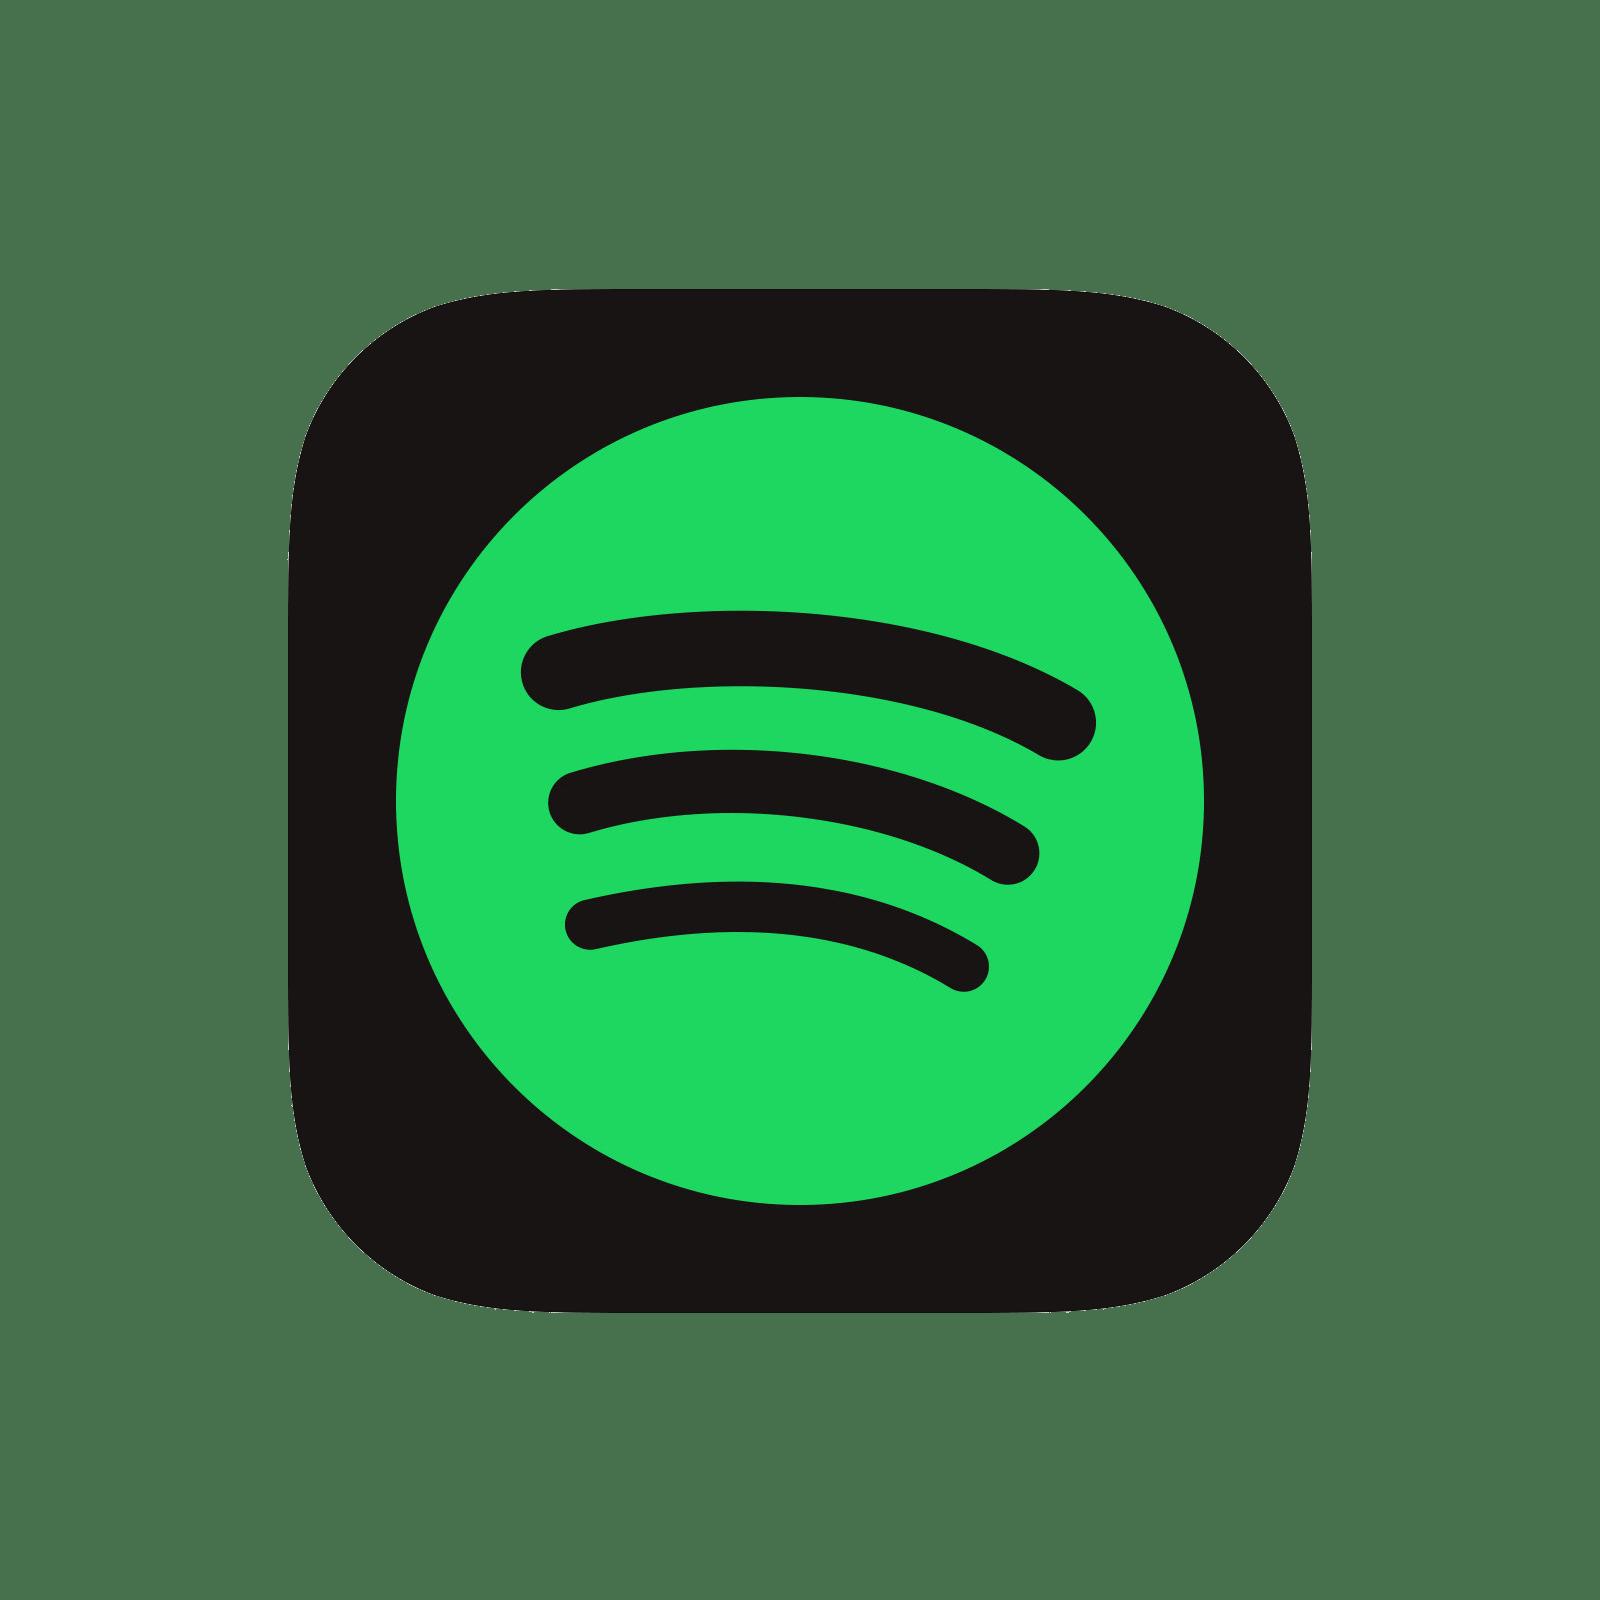 Spotify Premium gratis t.w.v. 9.99 euro per maand via MCO VISA Ruby Red card